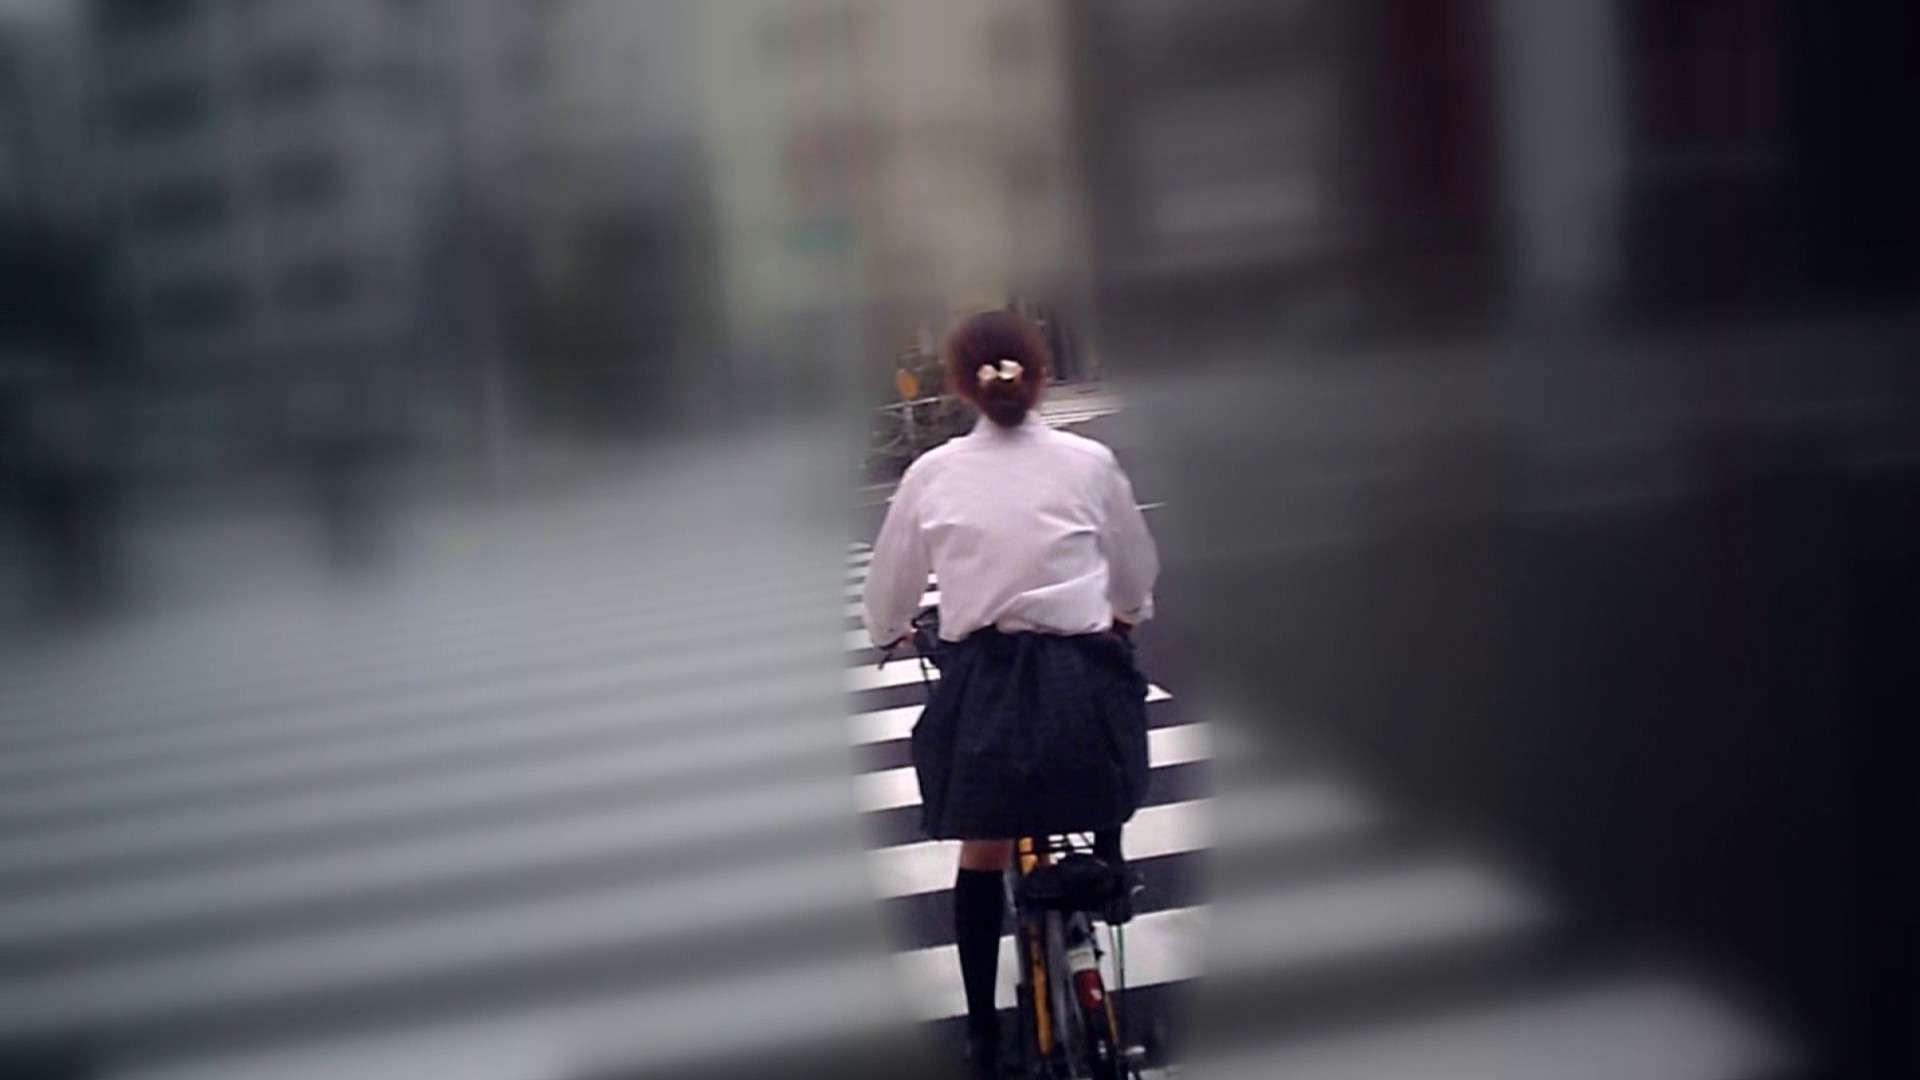 自転車パンチラ Vol.05 車 盗撮動画紹介 98PIX 4